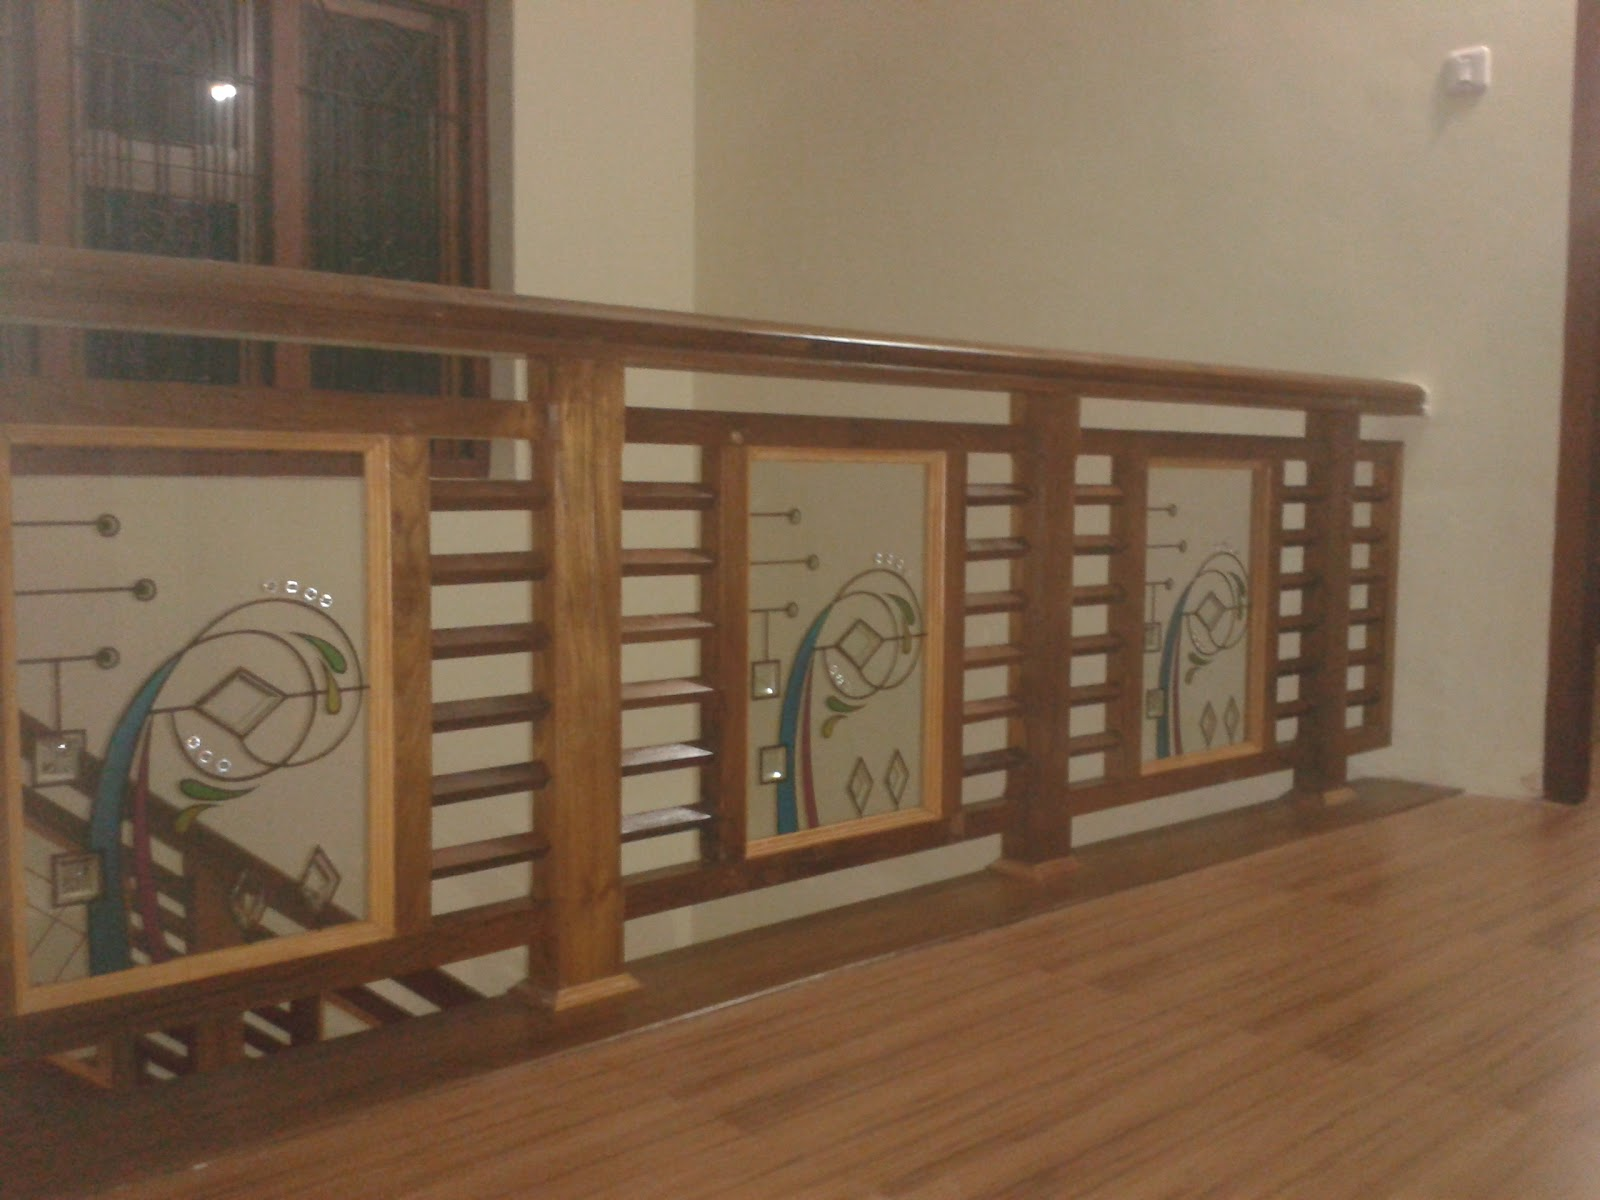 Build a building kerala style interior design work for Kerala style interior design photos